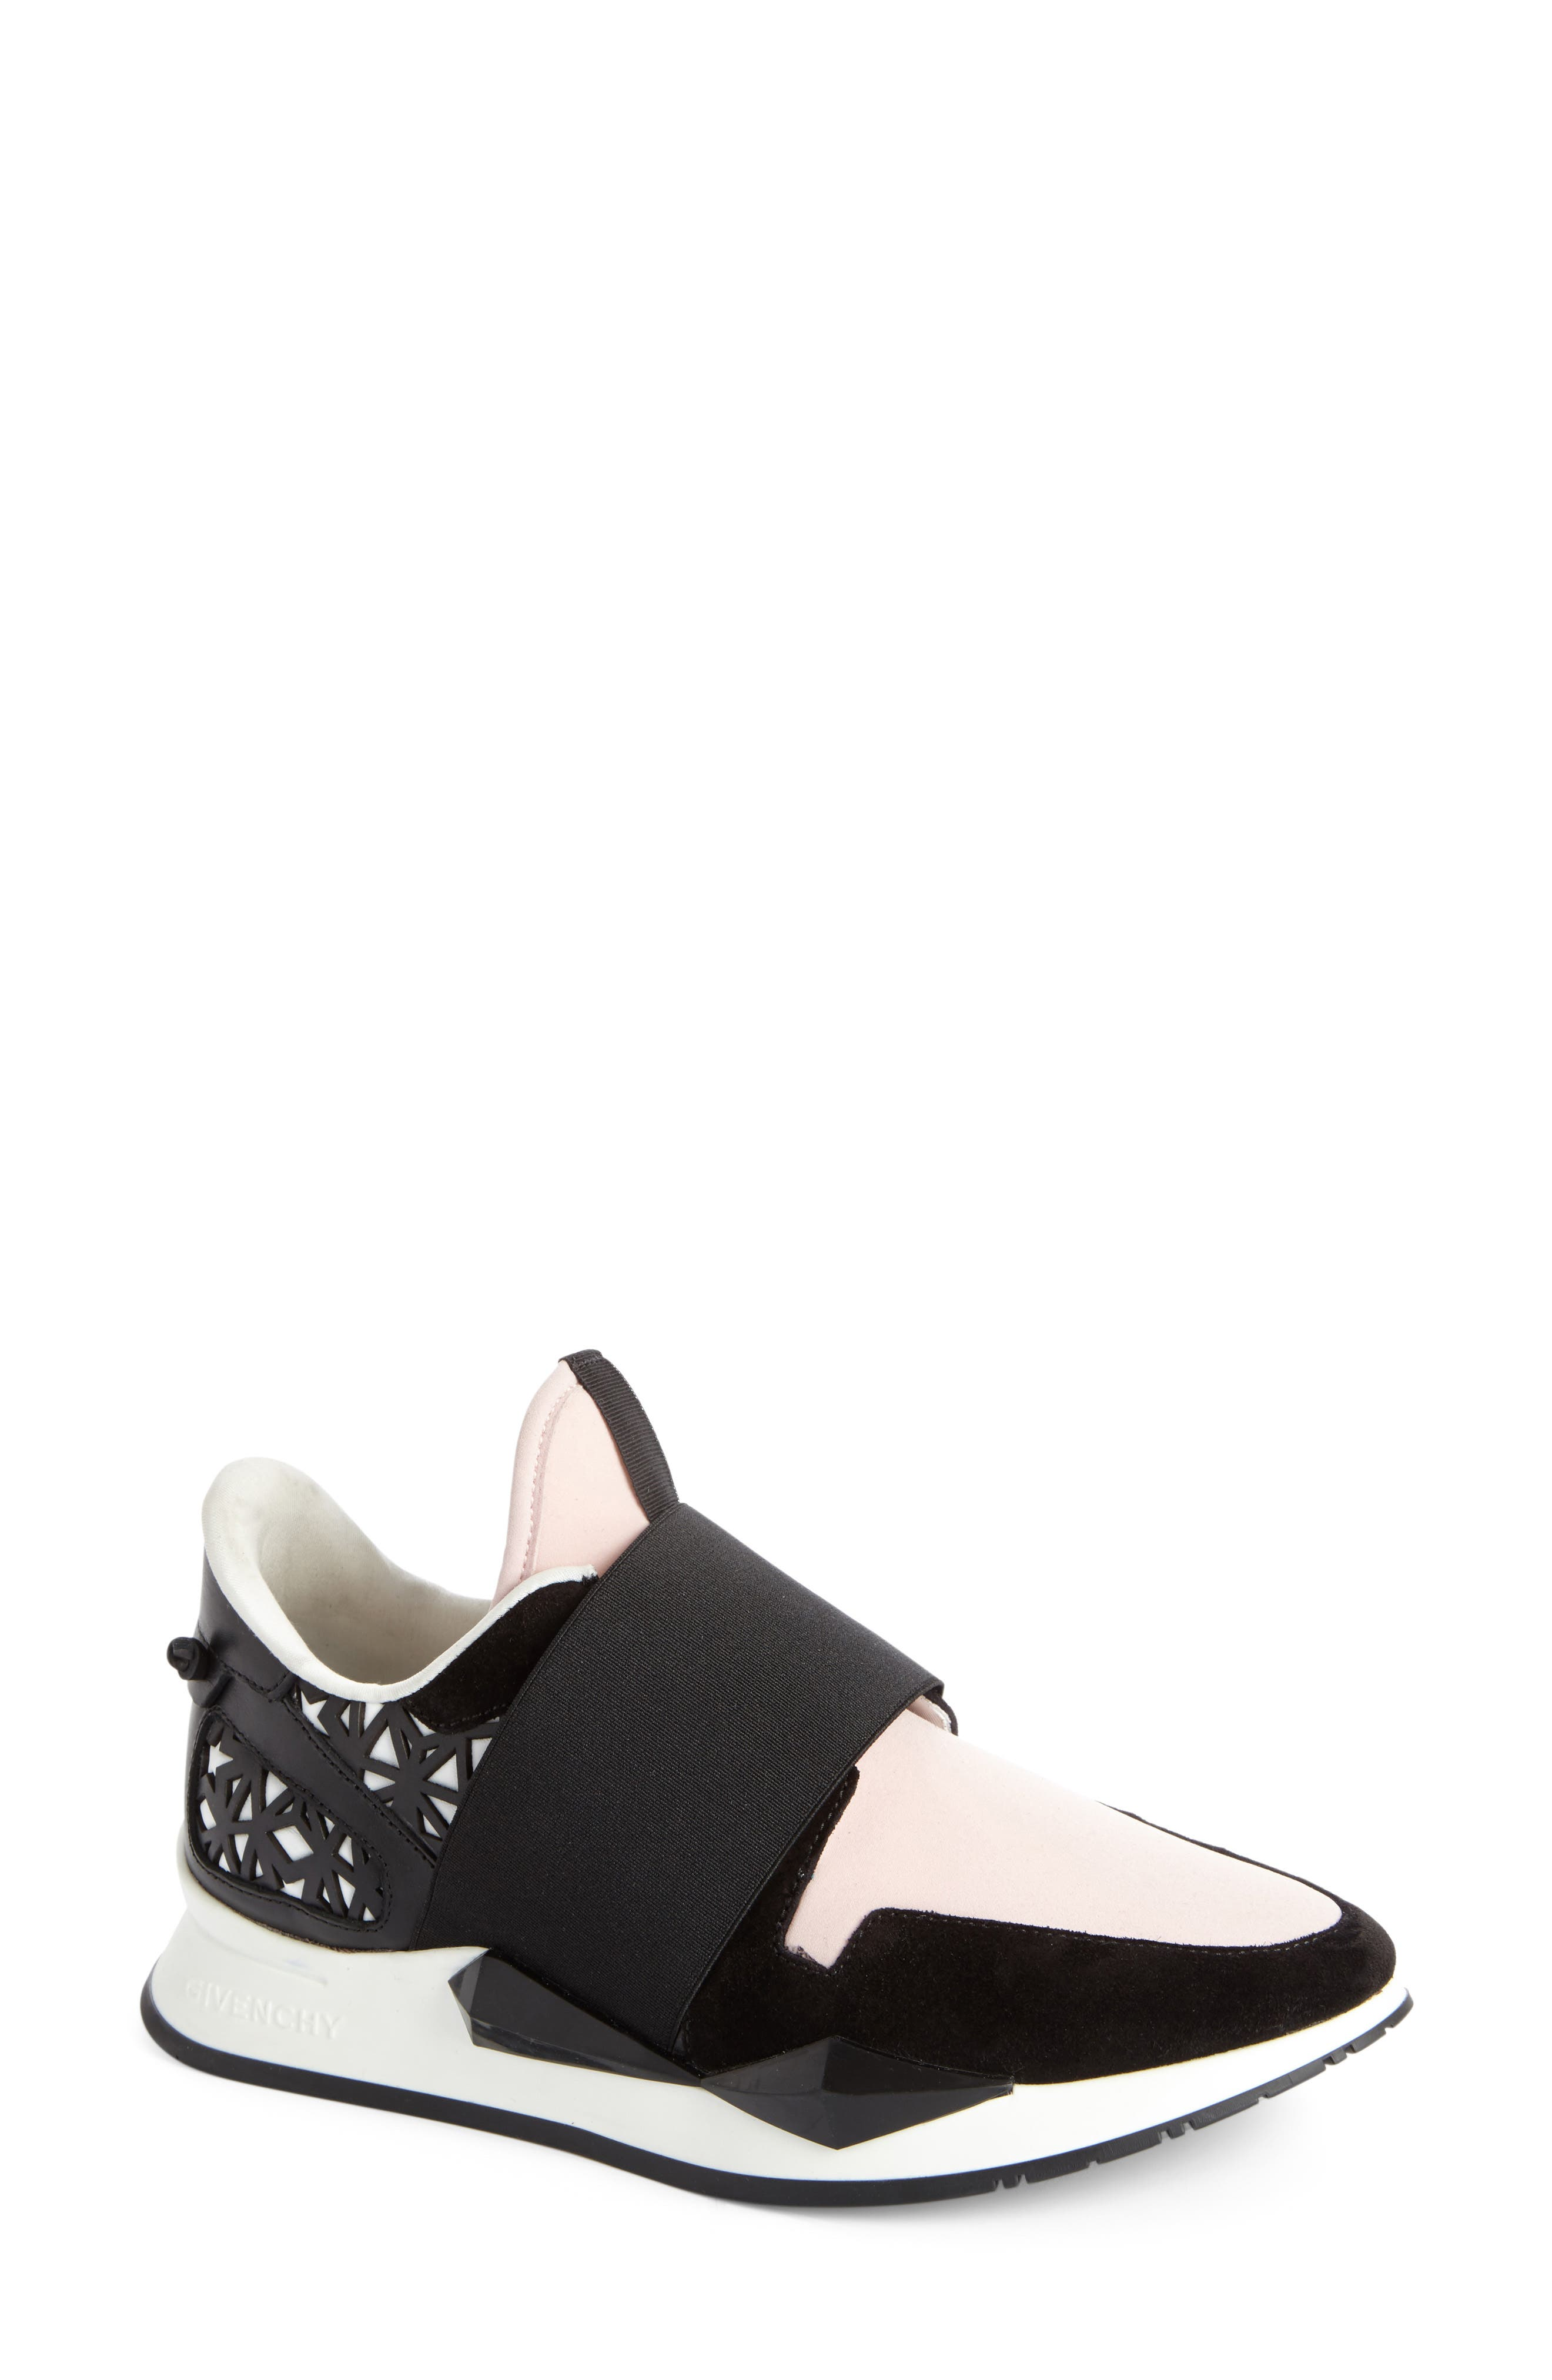 Slip-On Sneaker,                             Main thumbnail 1, color,                             Black/ Pink